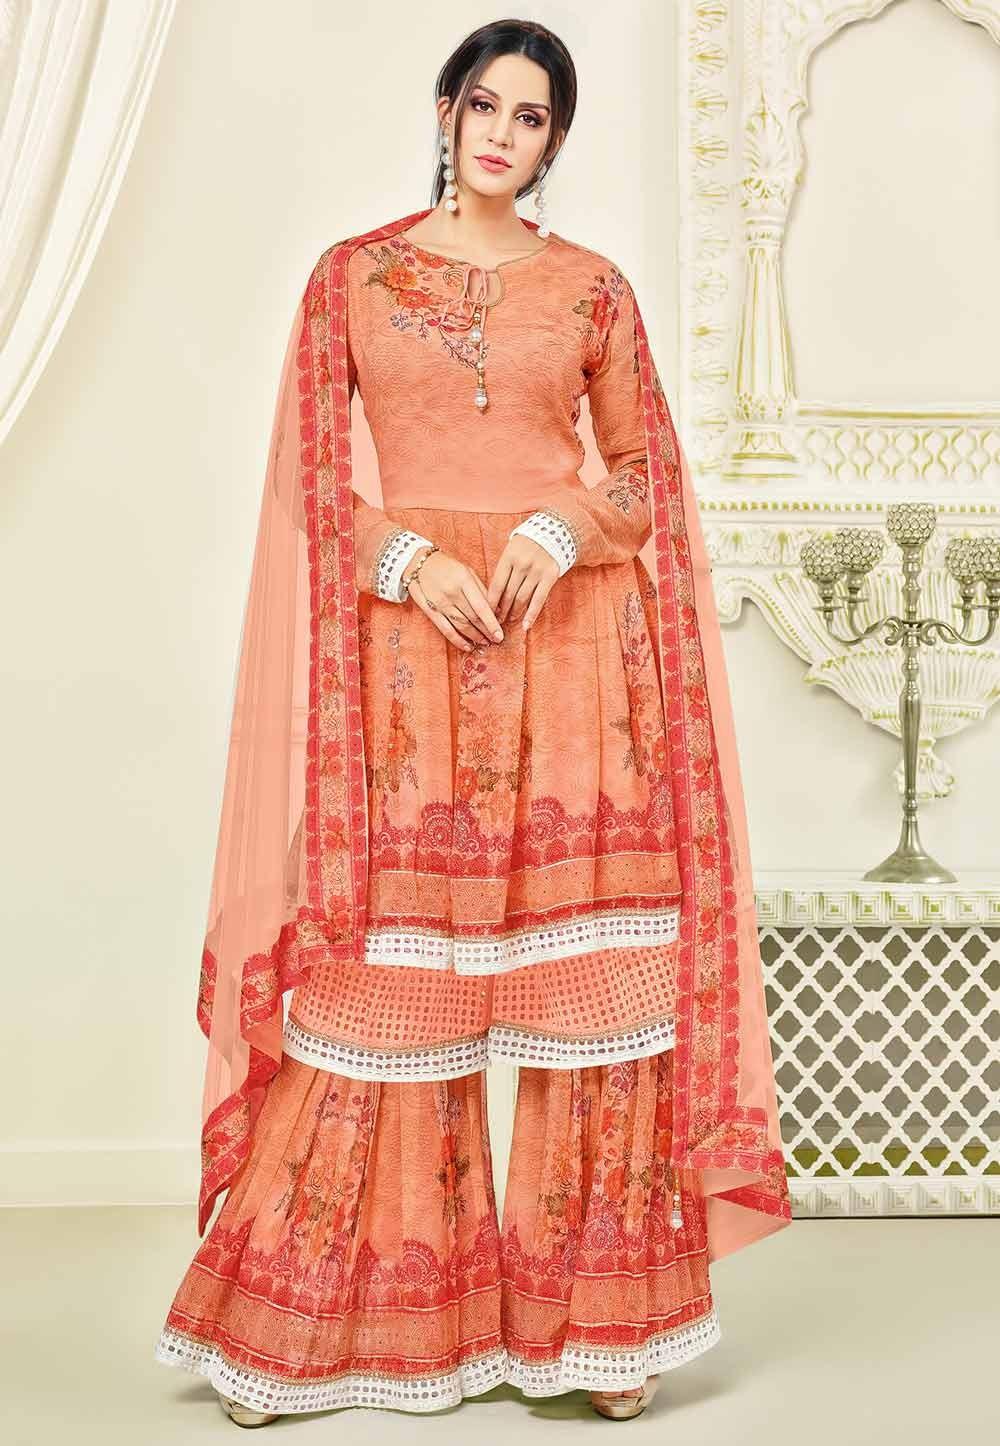 Sharara Style Astounding Salwar Kameez in Orange Color & Georgette Fabric